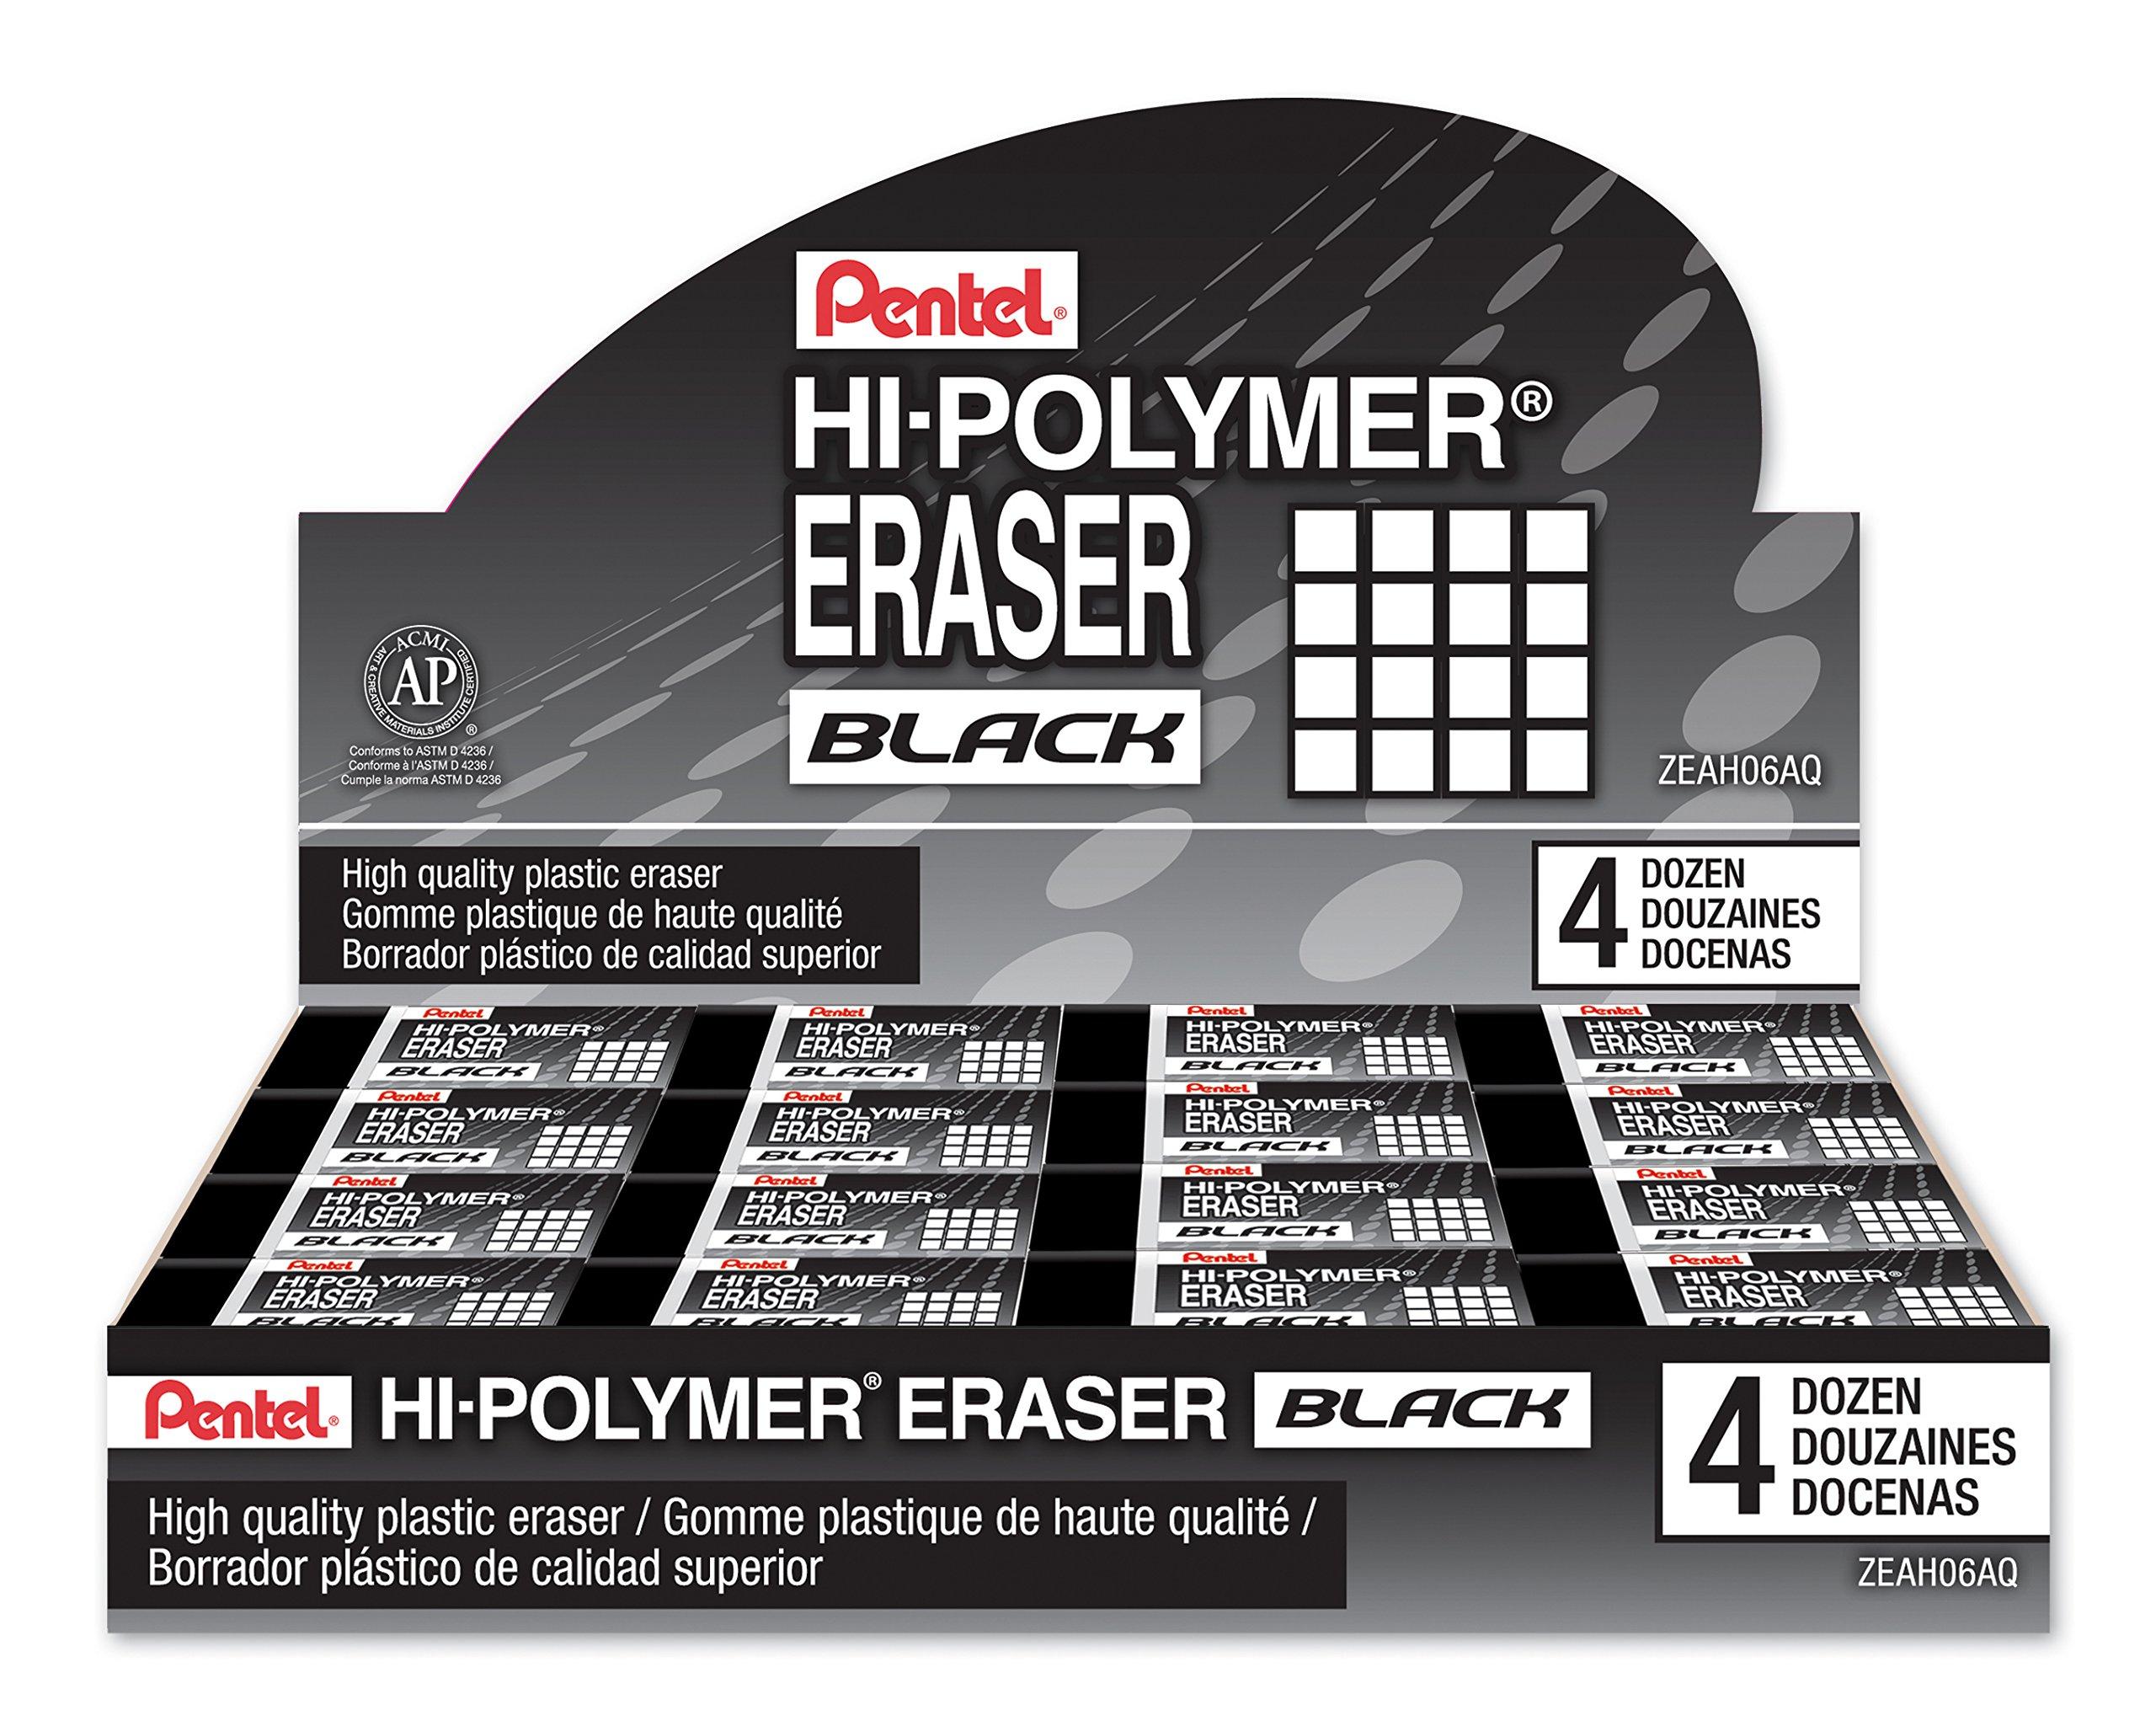 Pentel Hi-Polymer Block Eraser, Small Black 48 pack (ZEAH06A) by Pentel (Image #5)